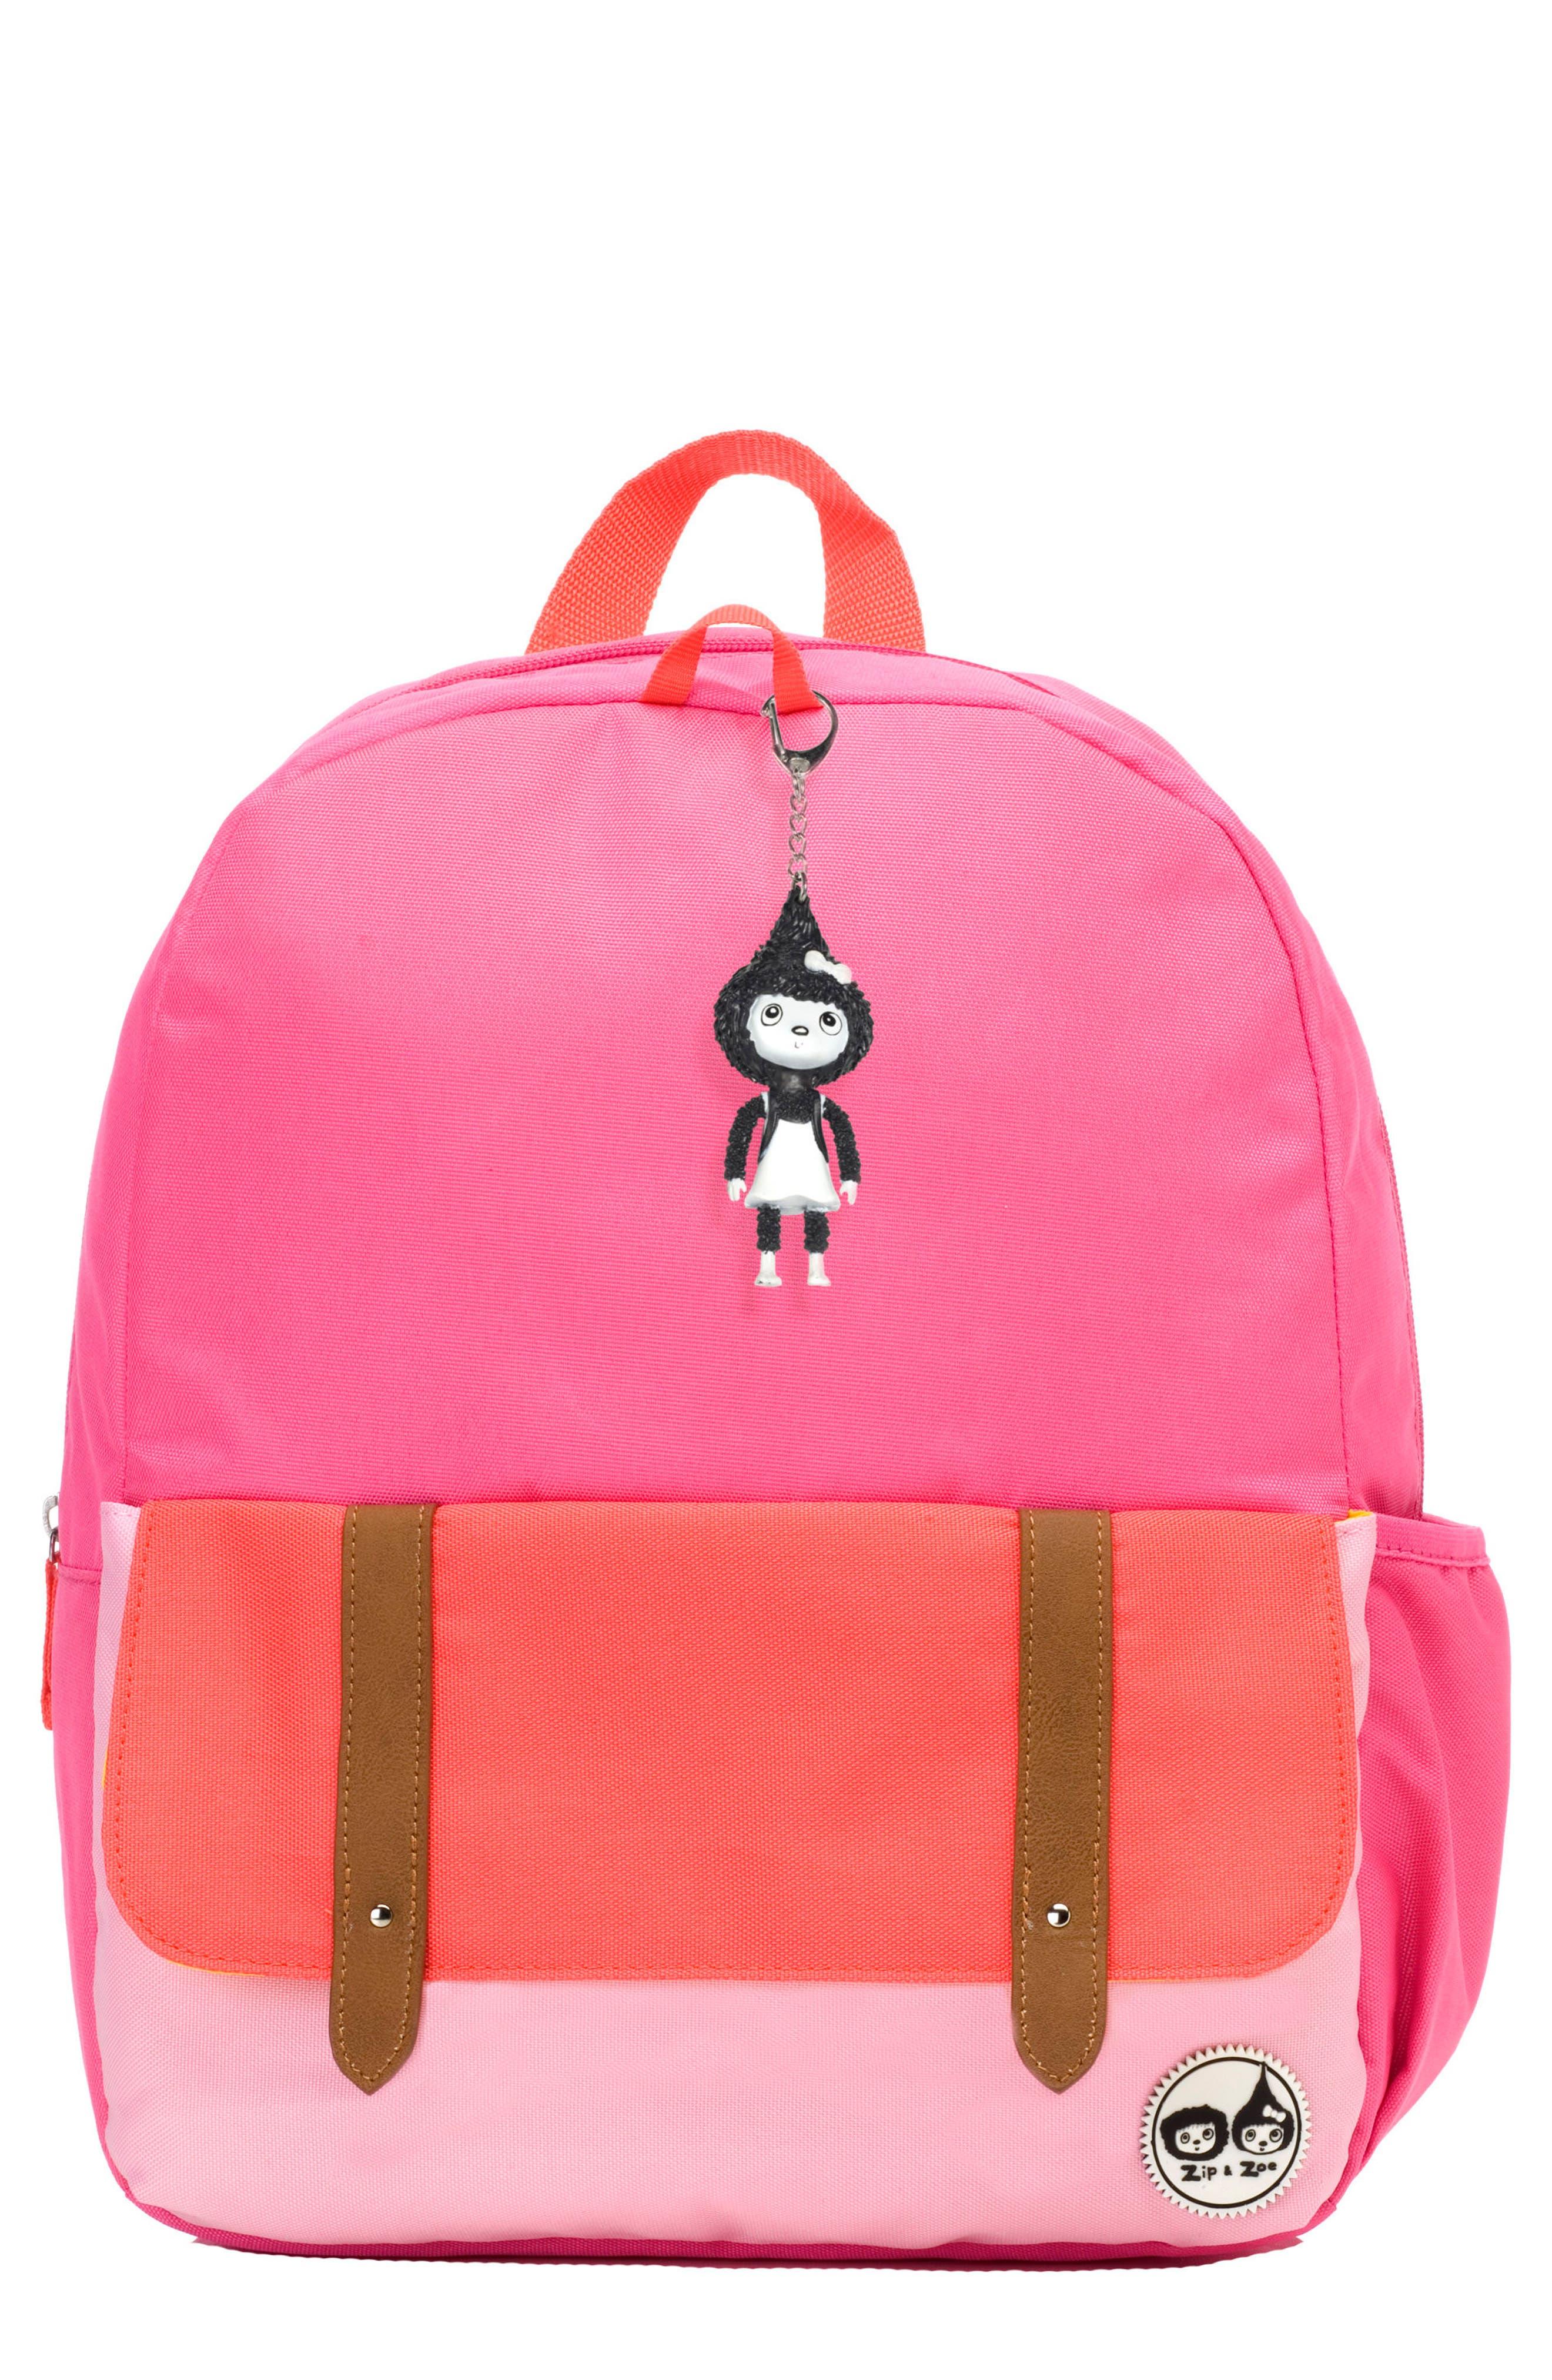 Main Image - Babymel Zip & Zoe Colorblock Junior Backpack (Kids)